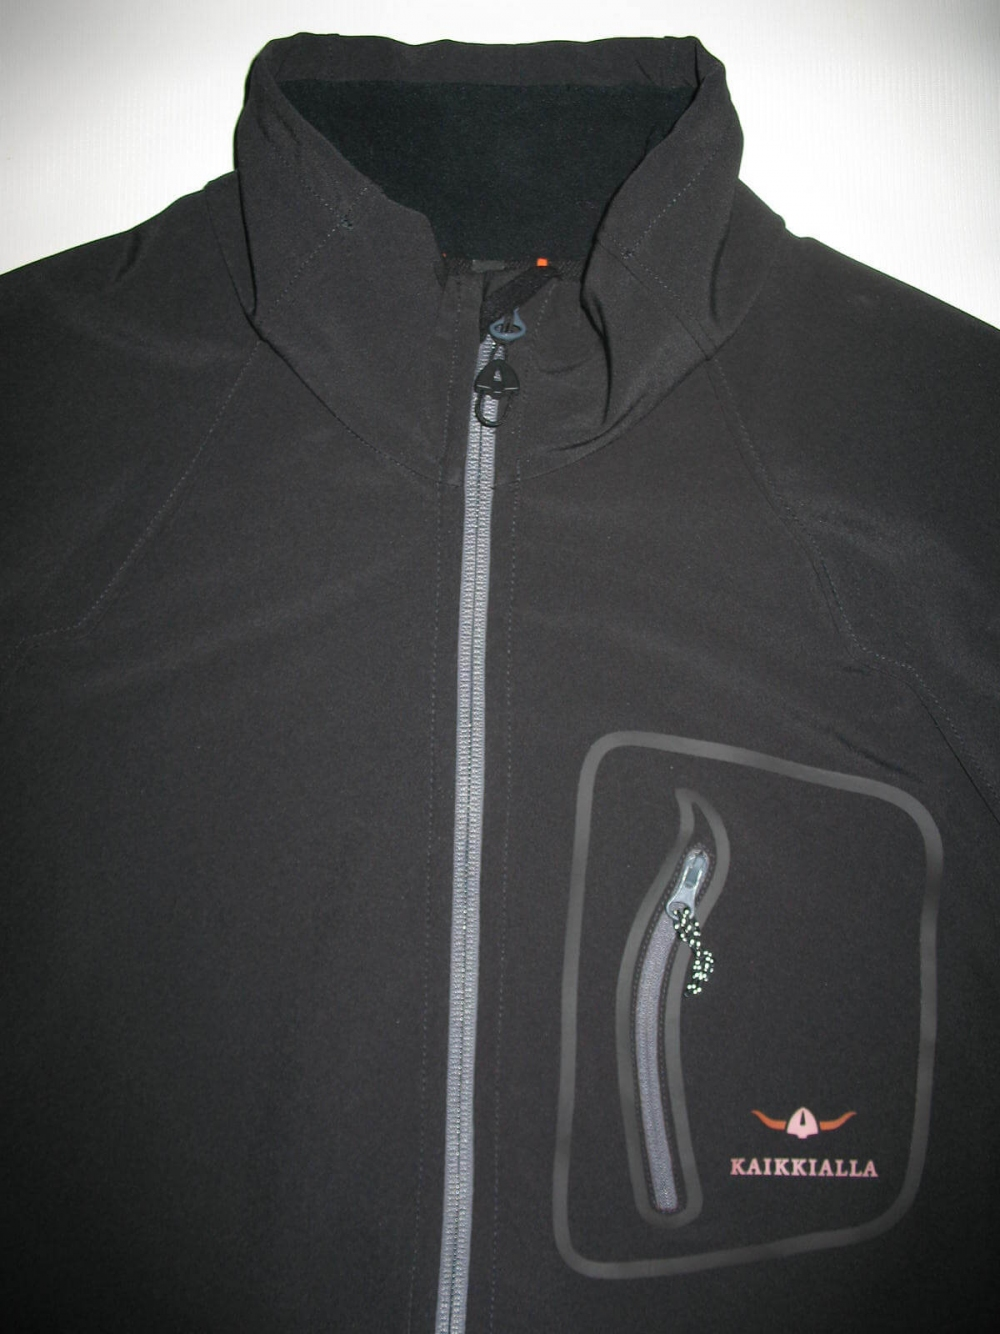 Жилет KAIKKIALLA softshell vest (размер L) - 2